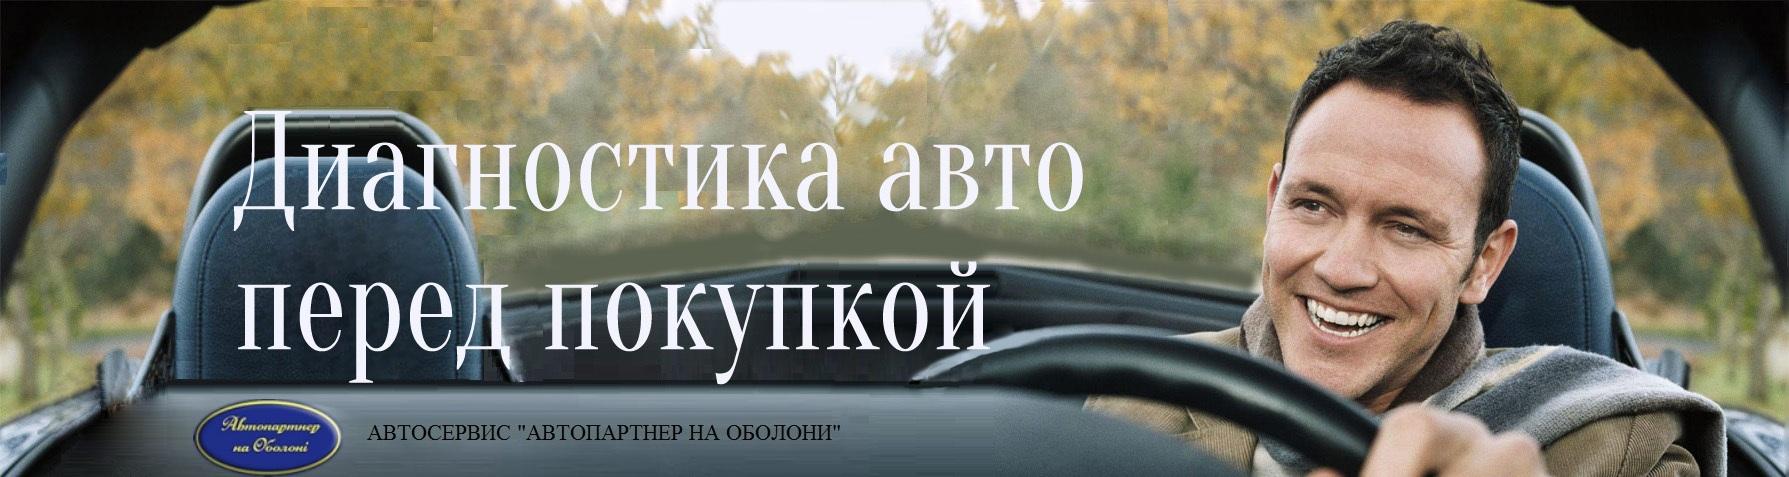 titlepic